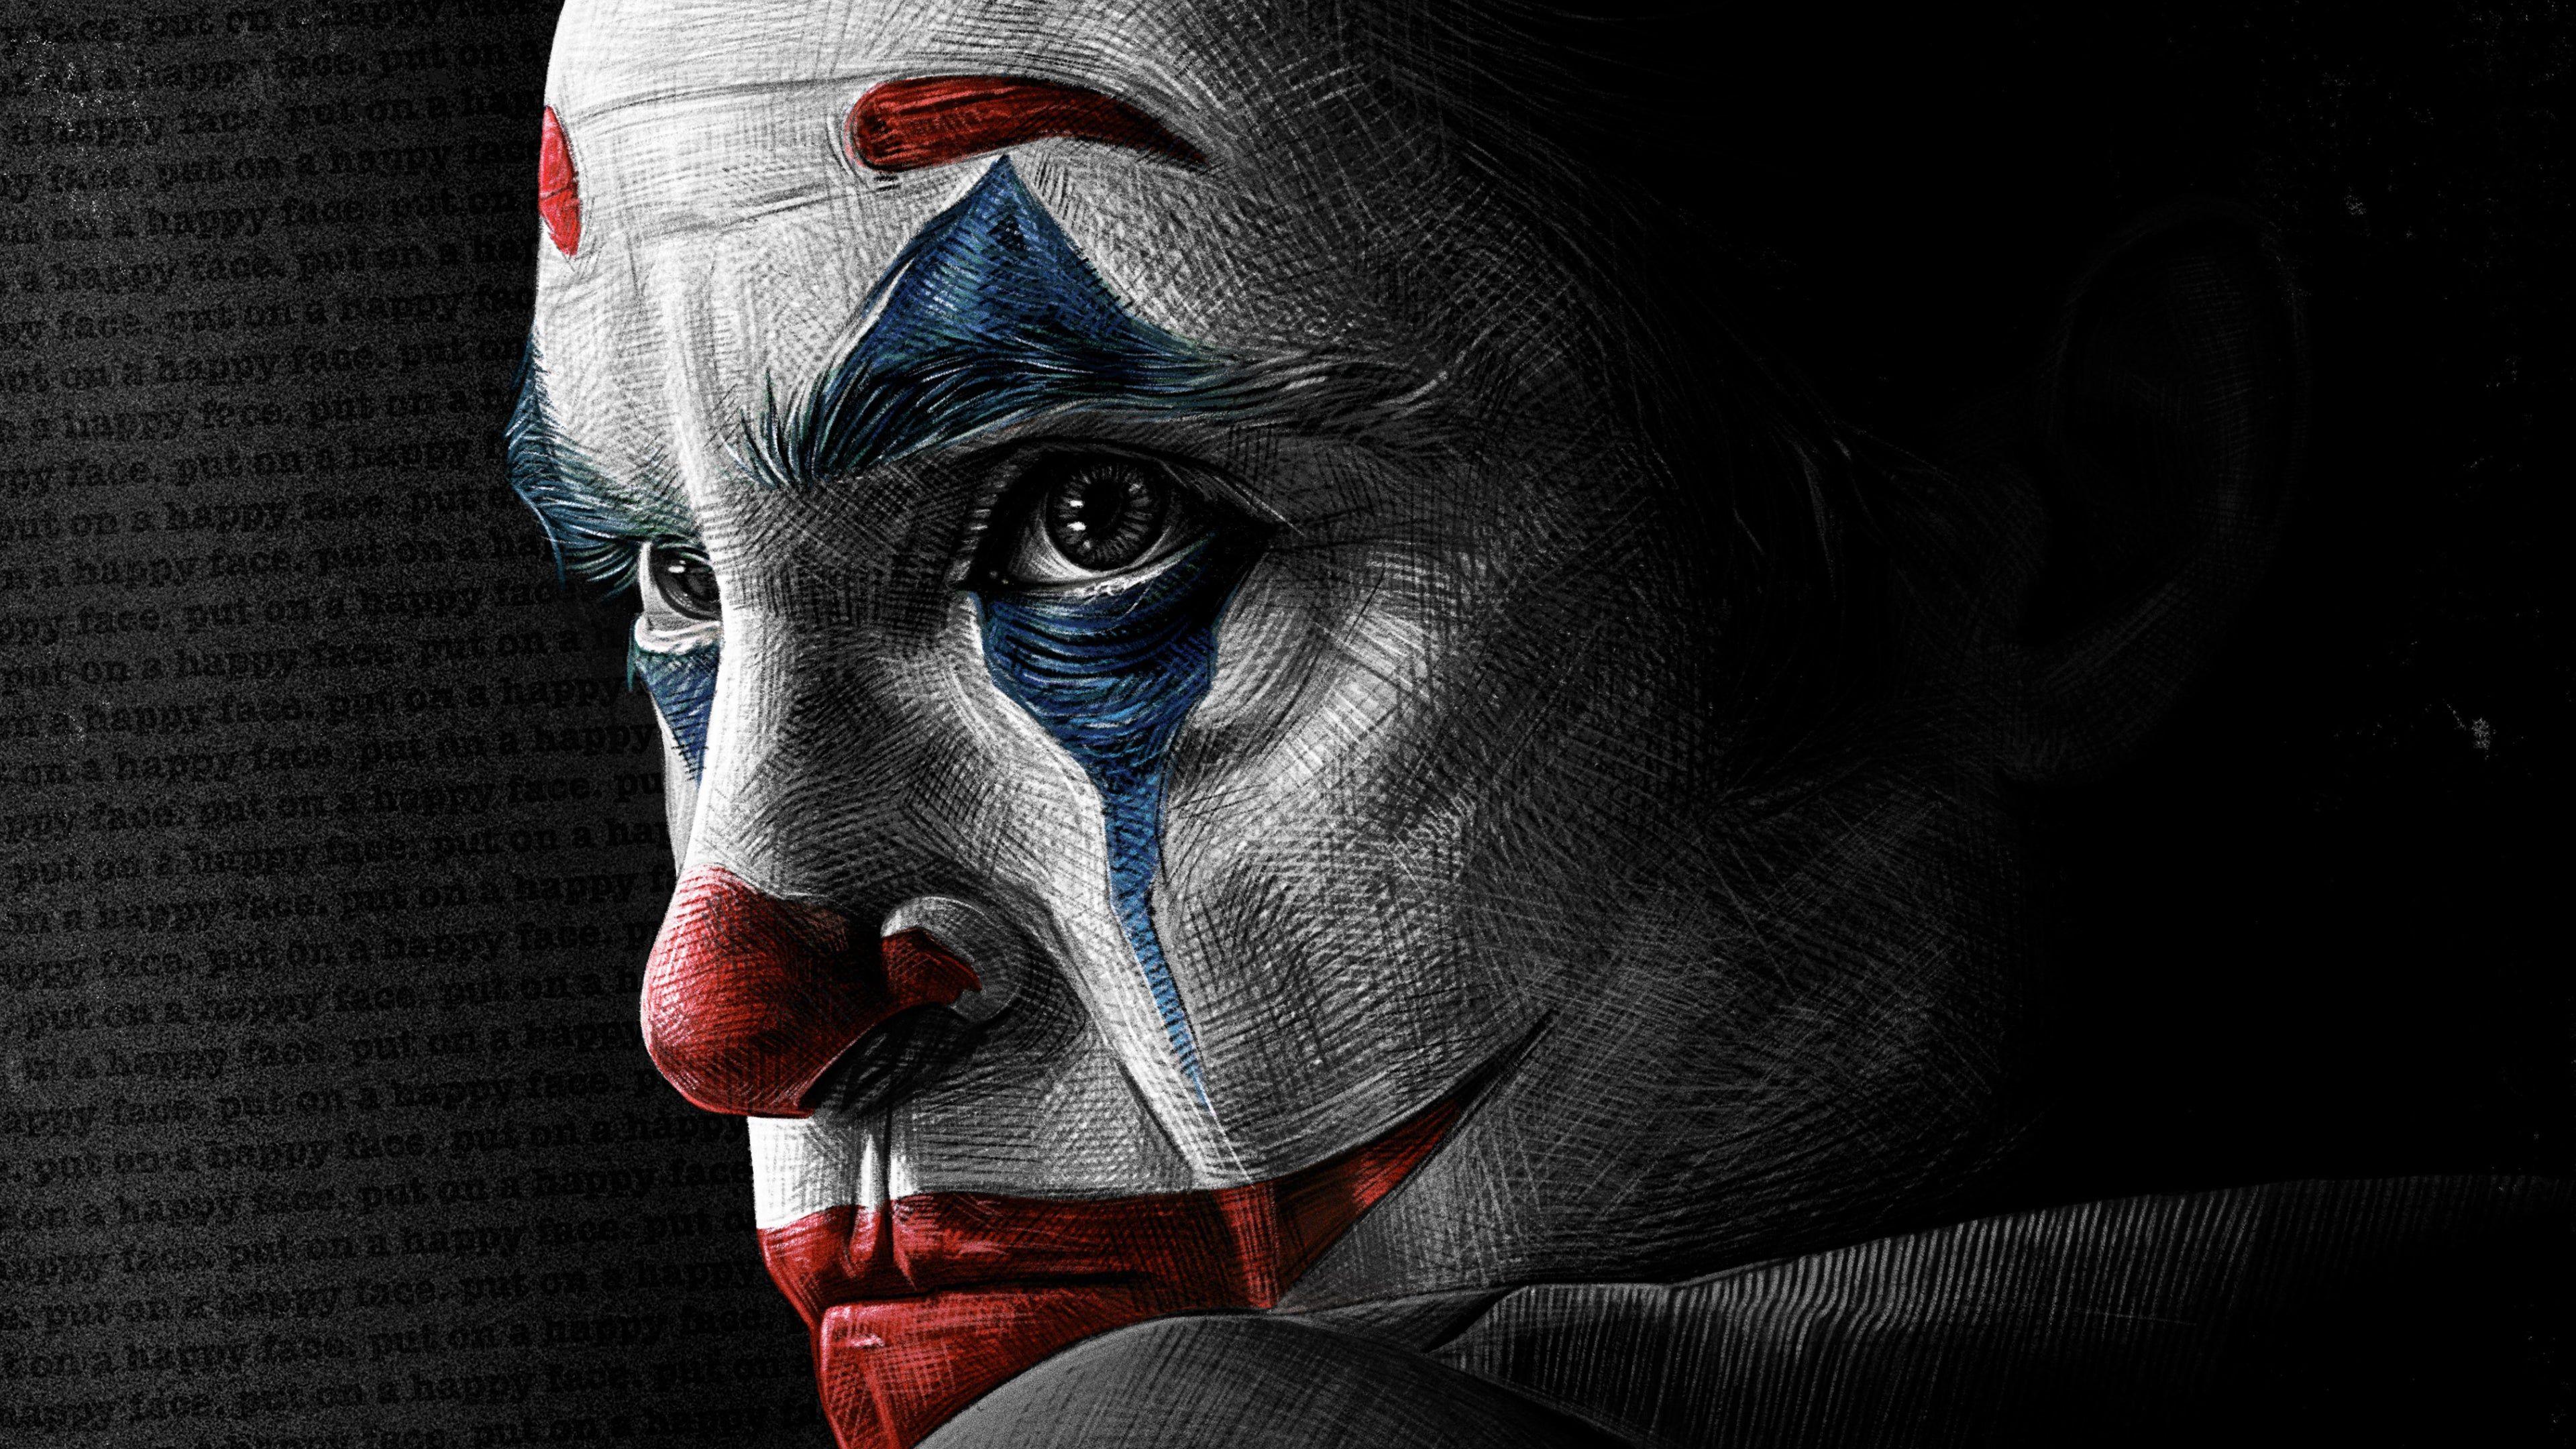 Joaquin Phoenix As Joker 4k Wallpaper Joker Full Movie Joker Wallpapers Joker Wallpaper